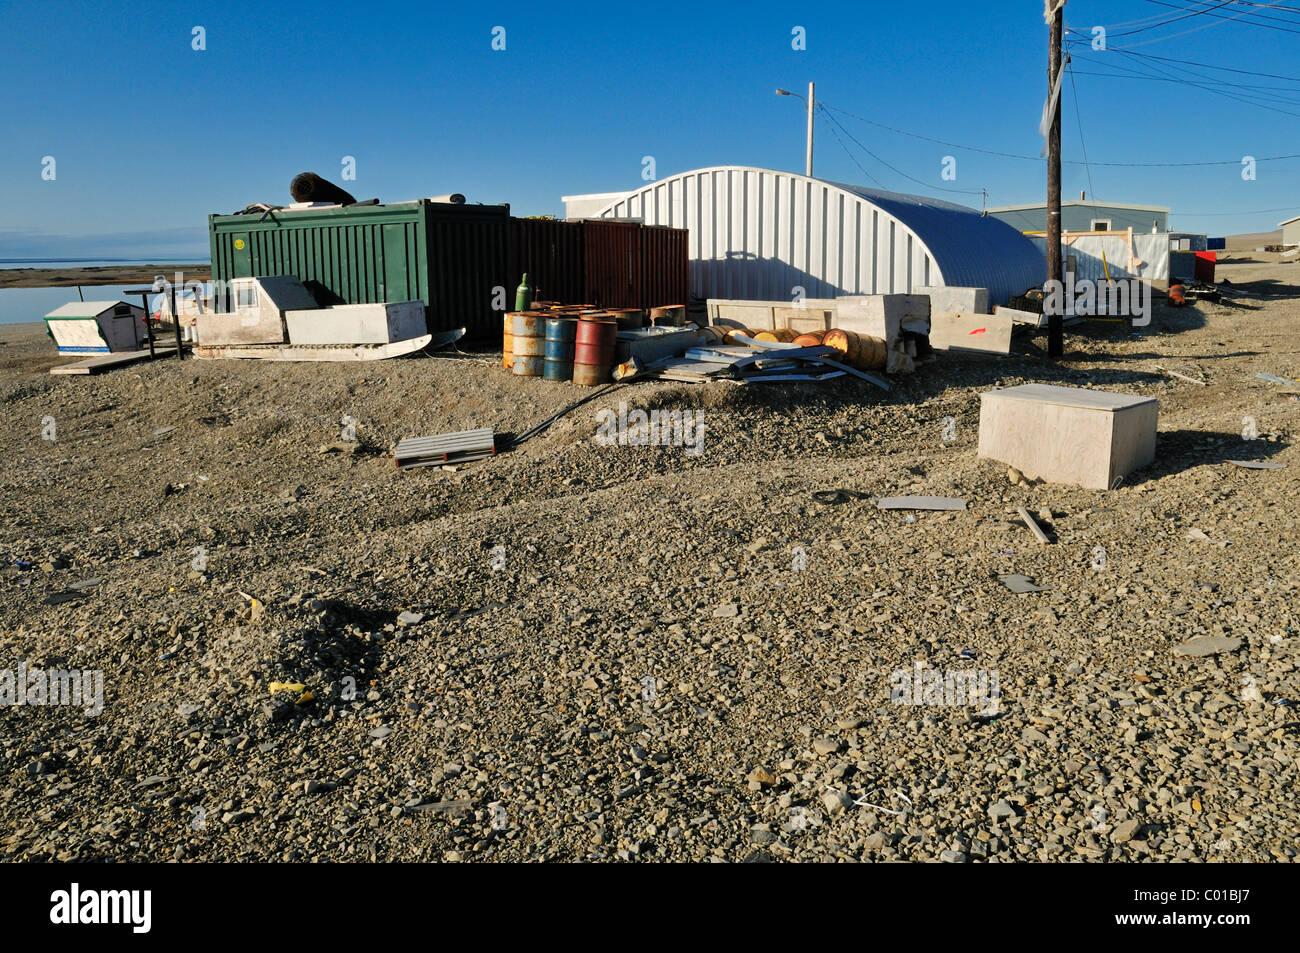 Inuit community Resolute Bay, Cornwallis Island, Northwest Passage, Nunavut, Canada, Arctic - Stock Image